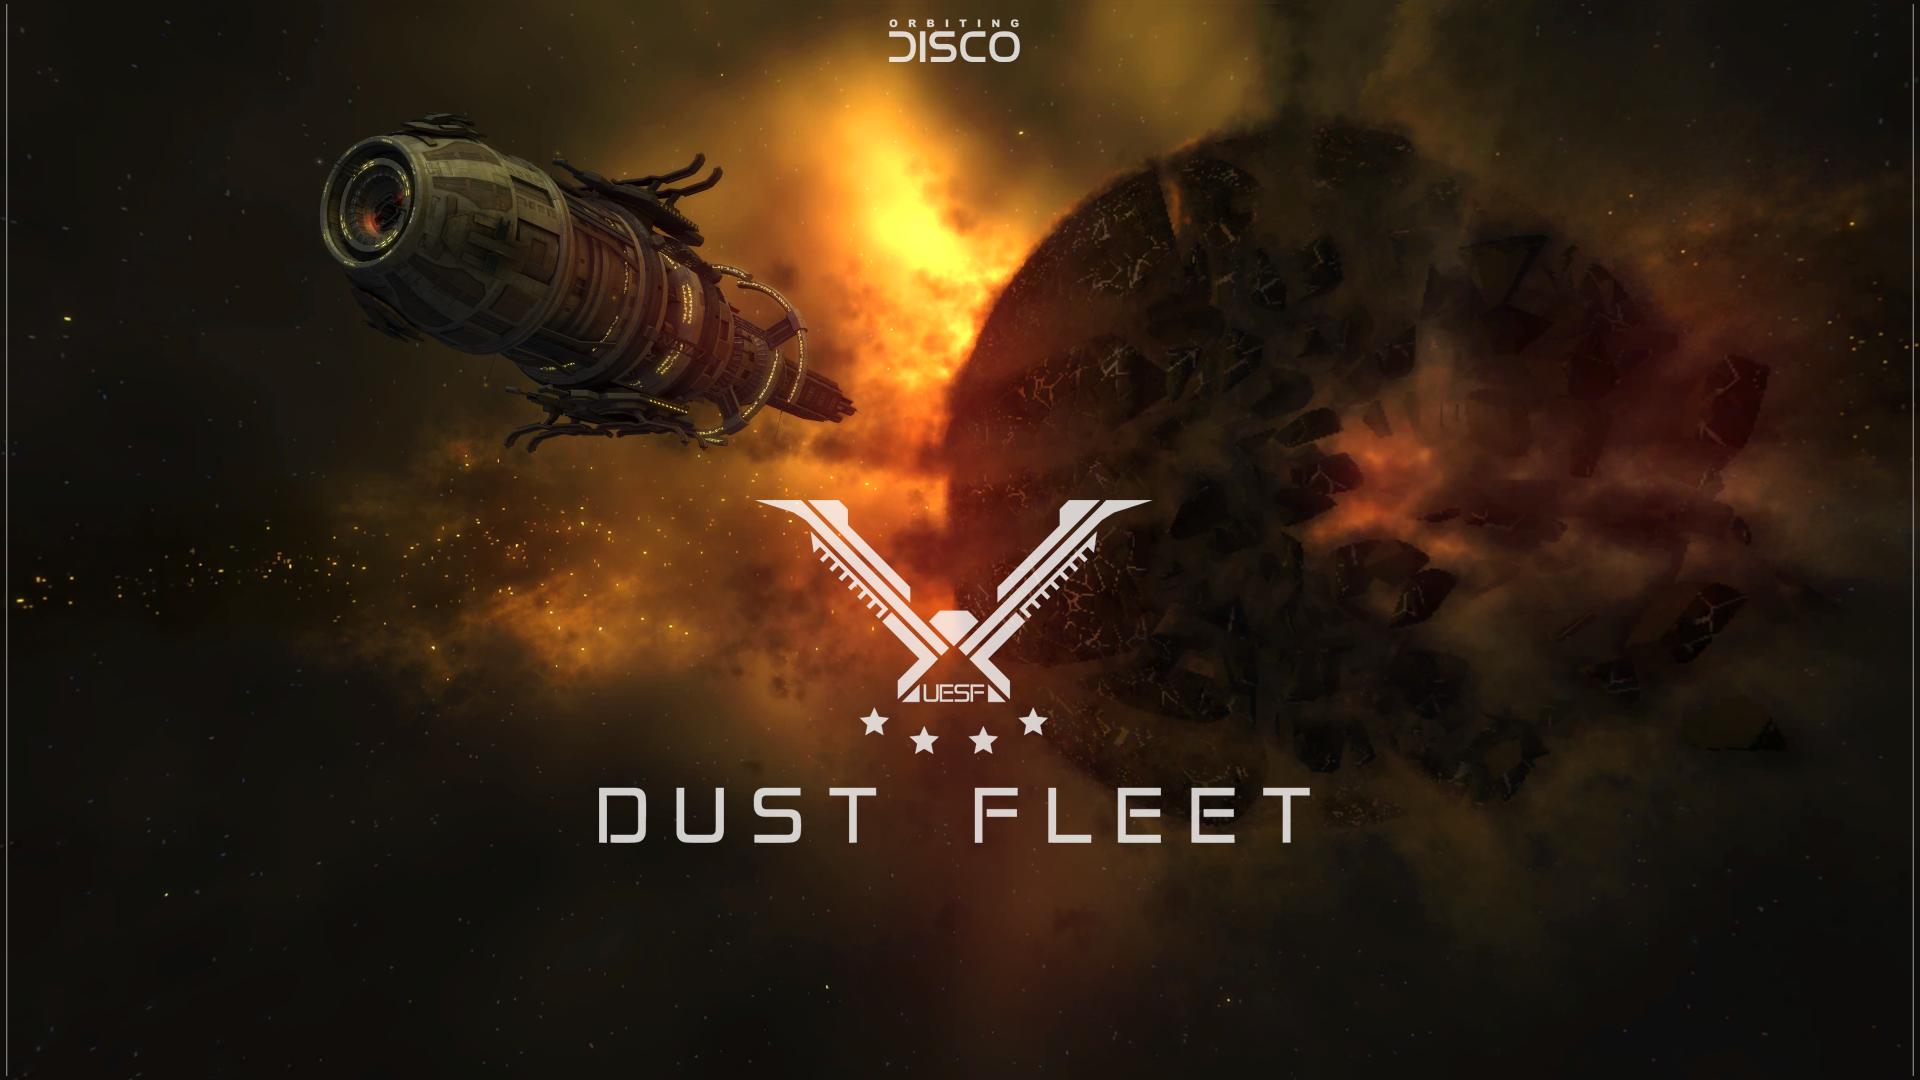 Dust Fleet title card